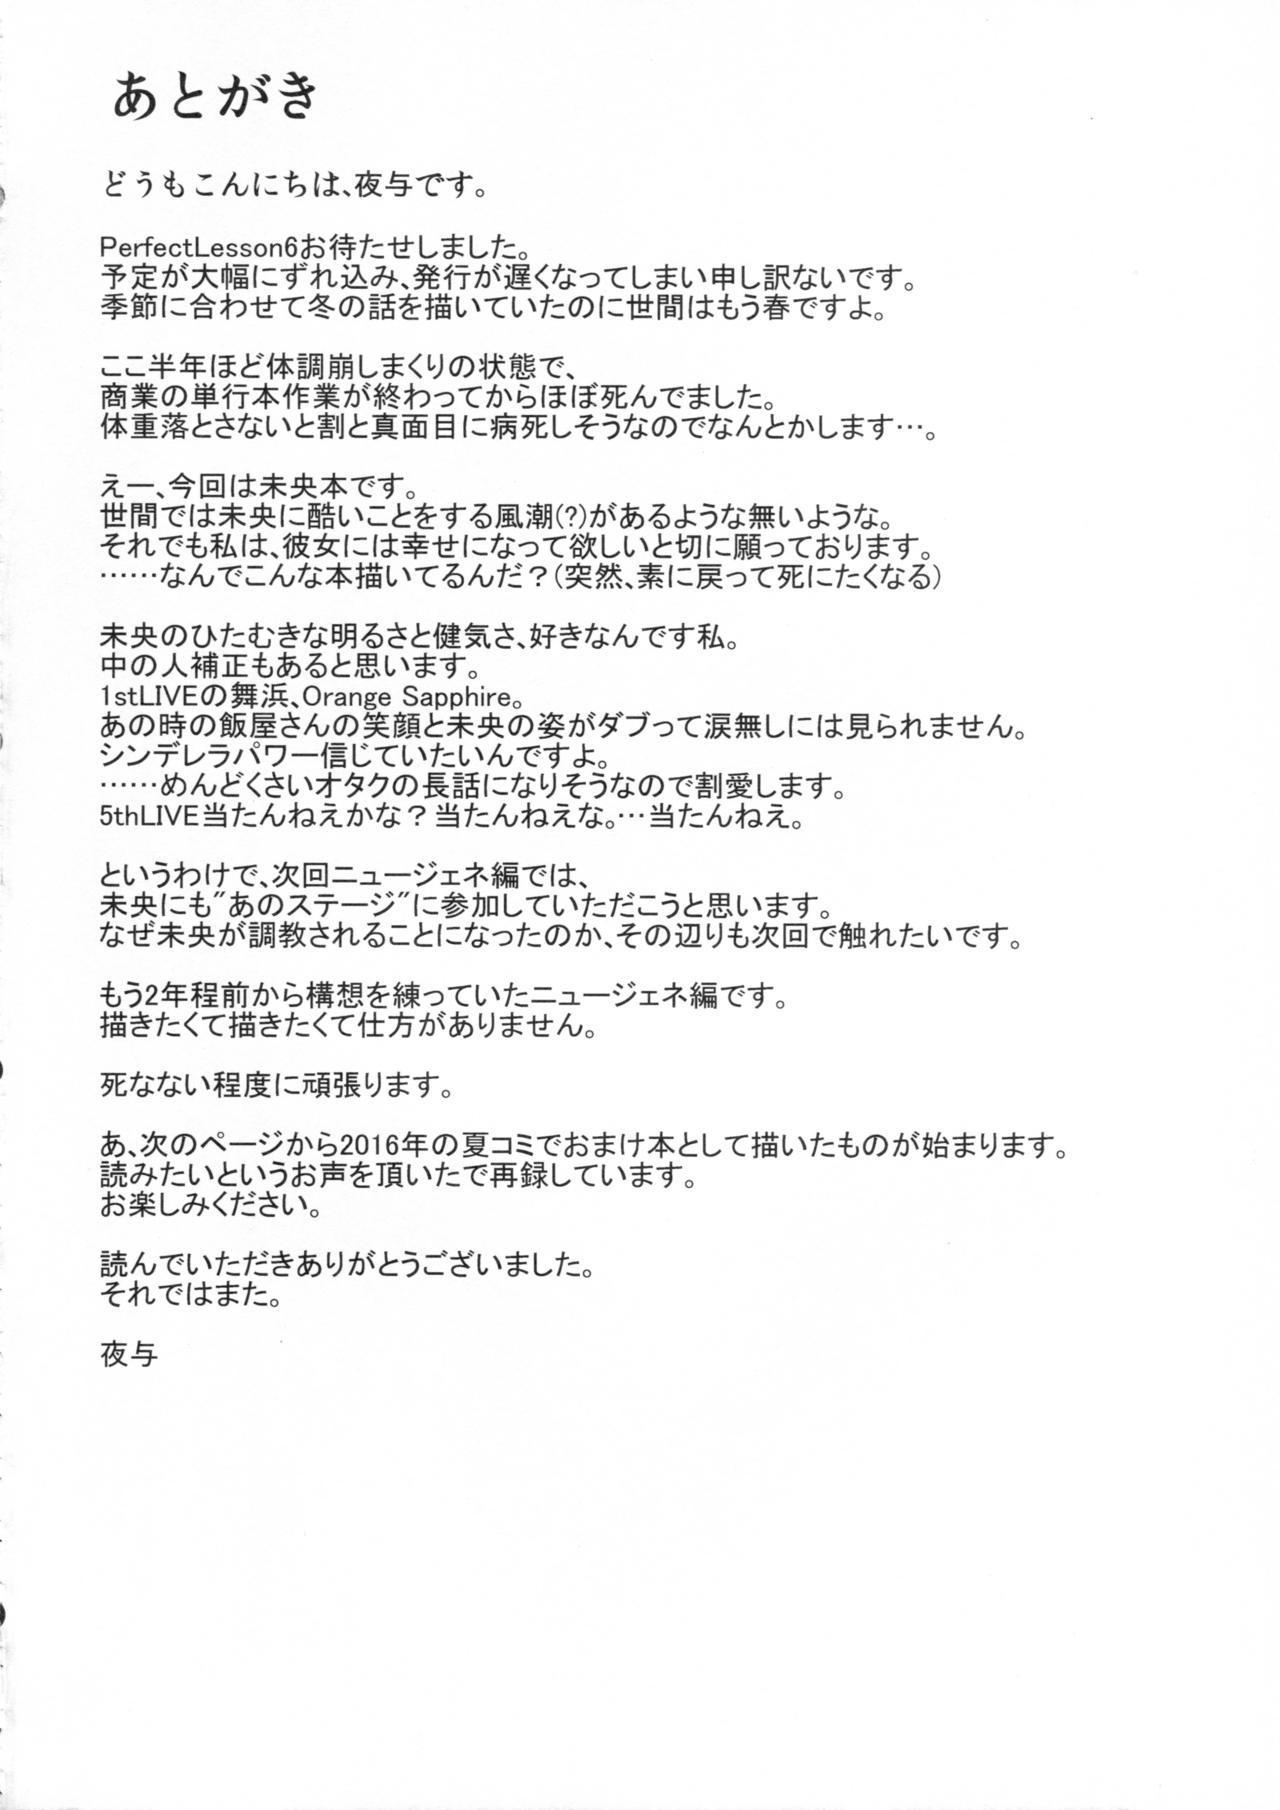 Perfect Lesson 6 - Honda Mio Yagai Choukyou 24